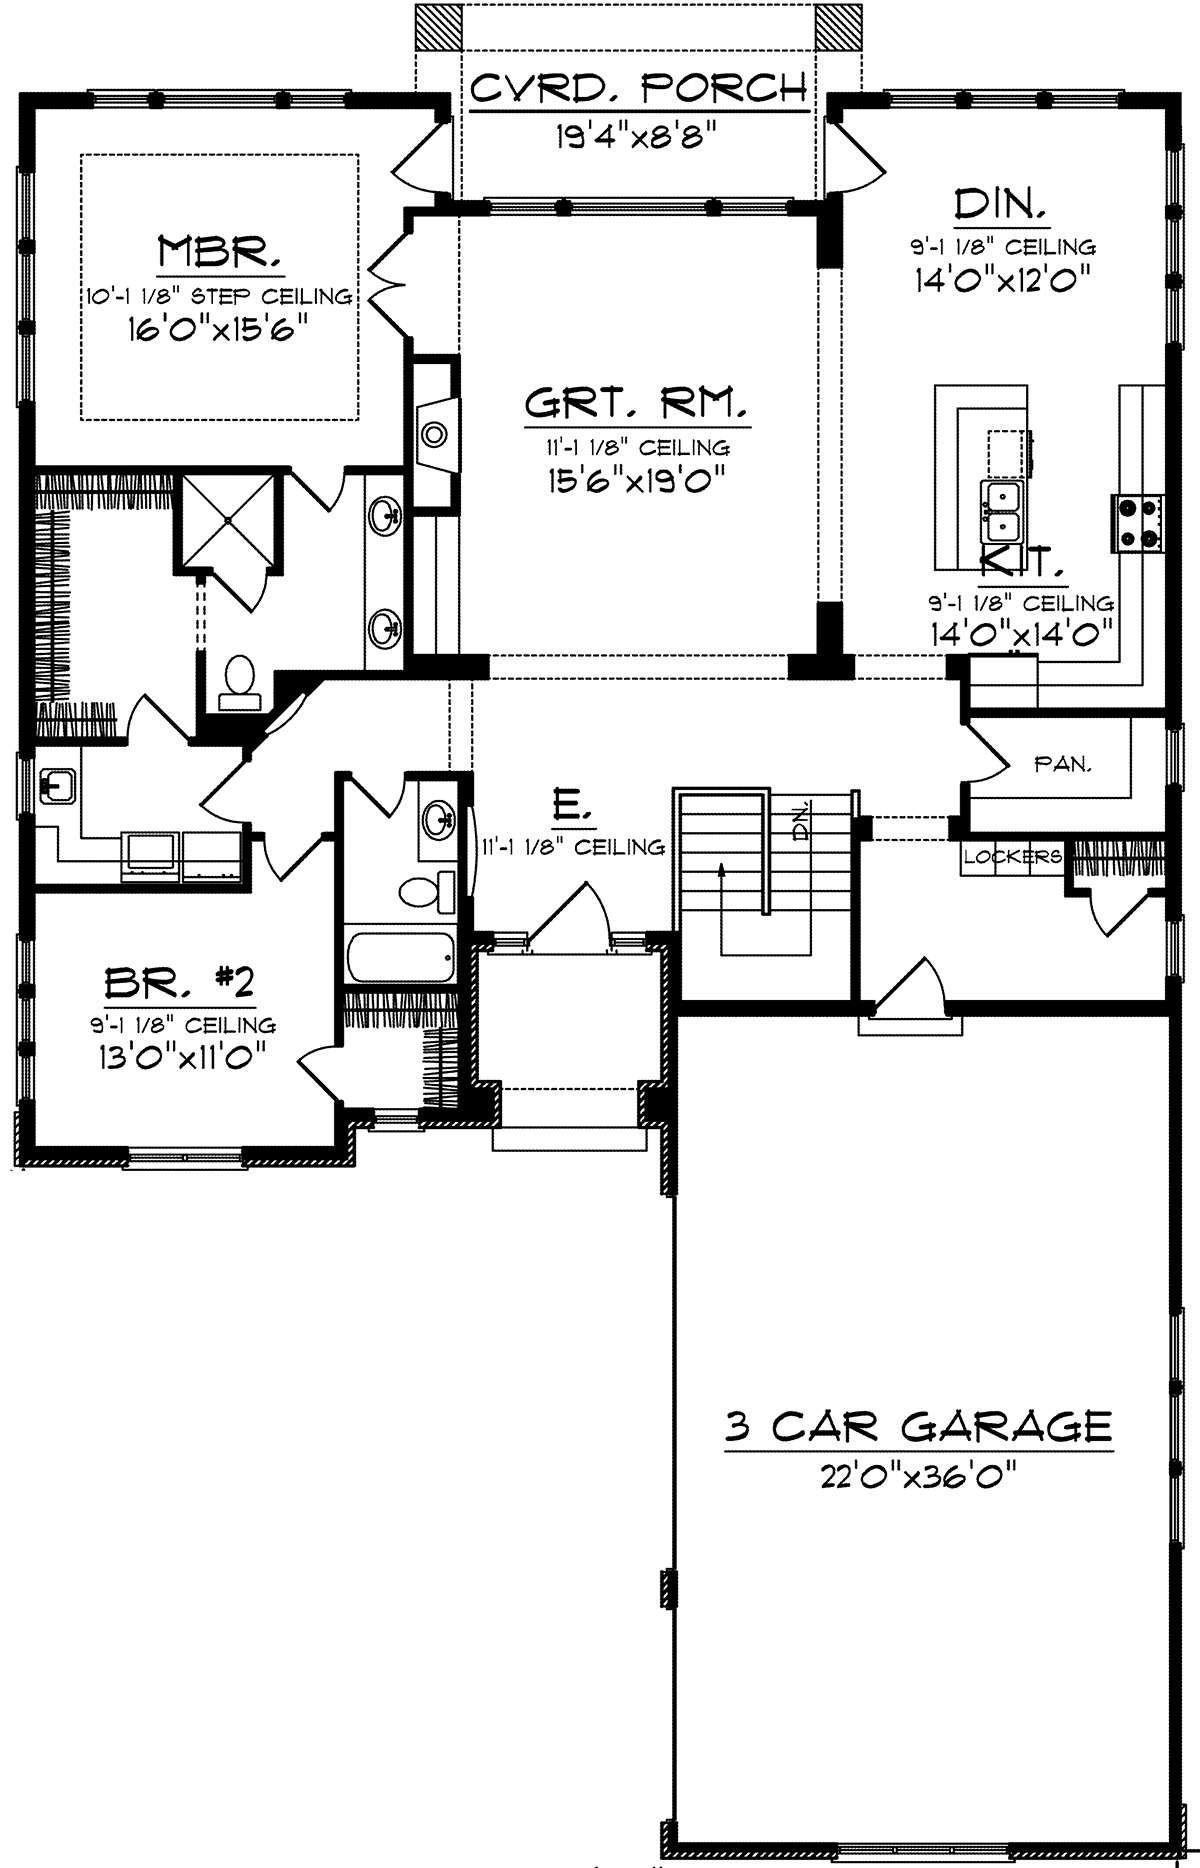 House Plan 1020 00306 Southwest Plan 1 993 Square Feet 2 Bedrooms 2 Bathrooms Narrow Lot House Plans Craftsman House Plans House Blueprints